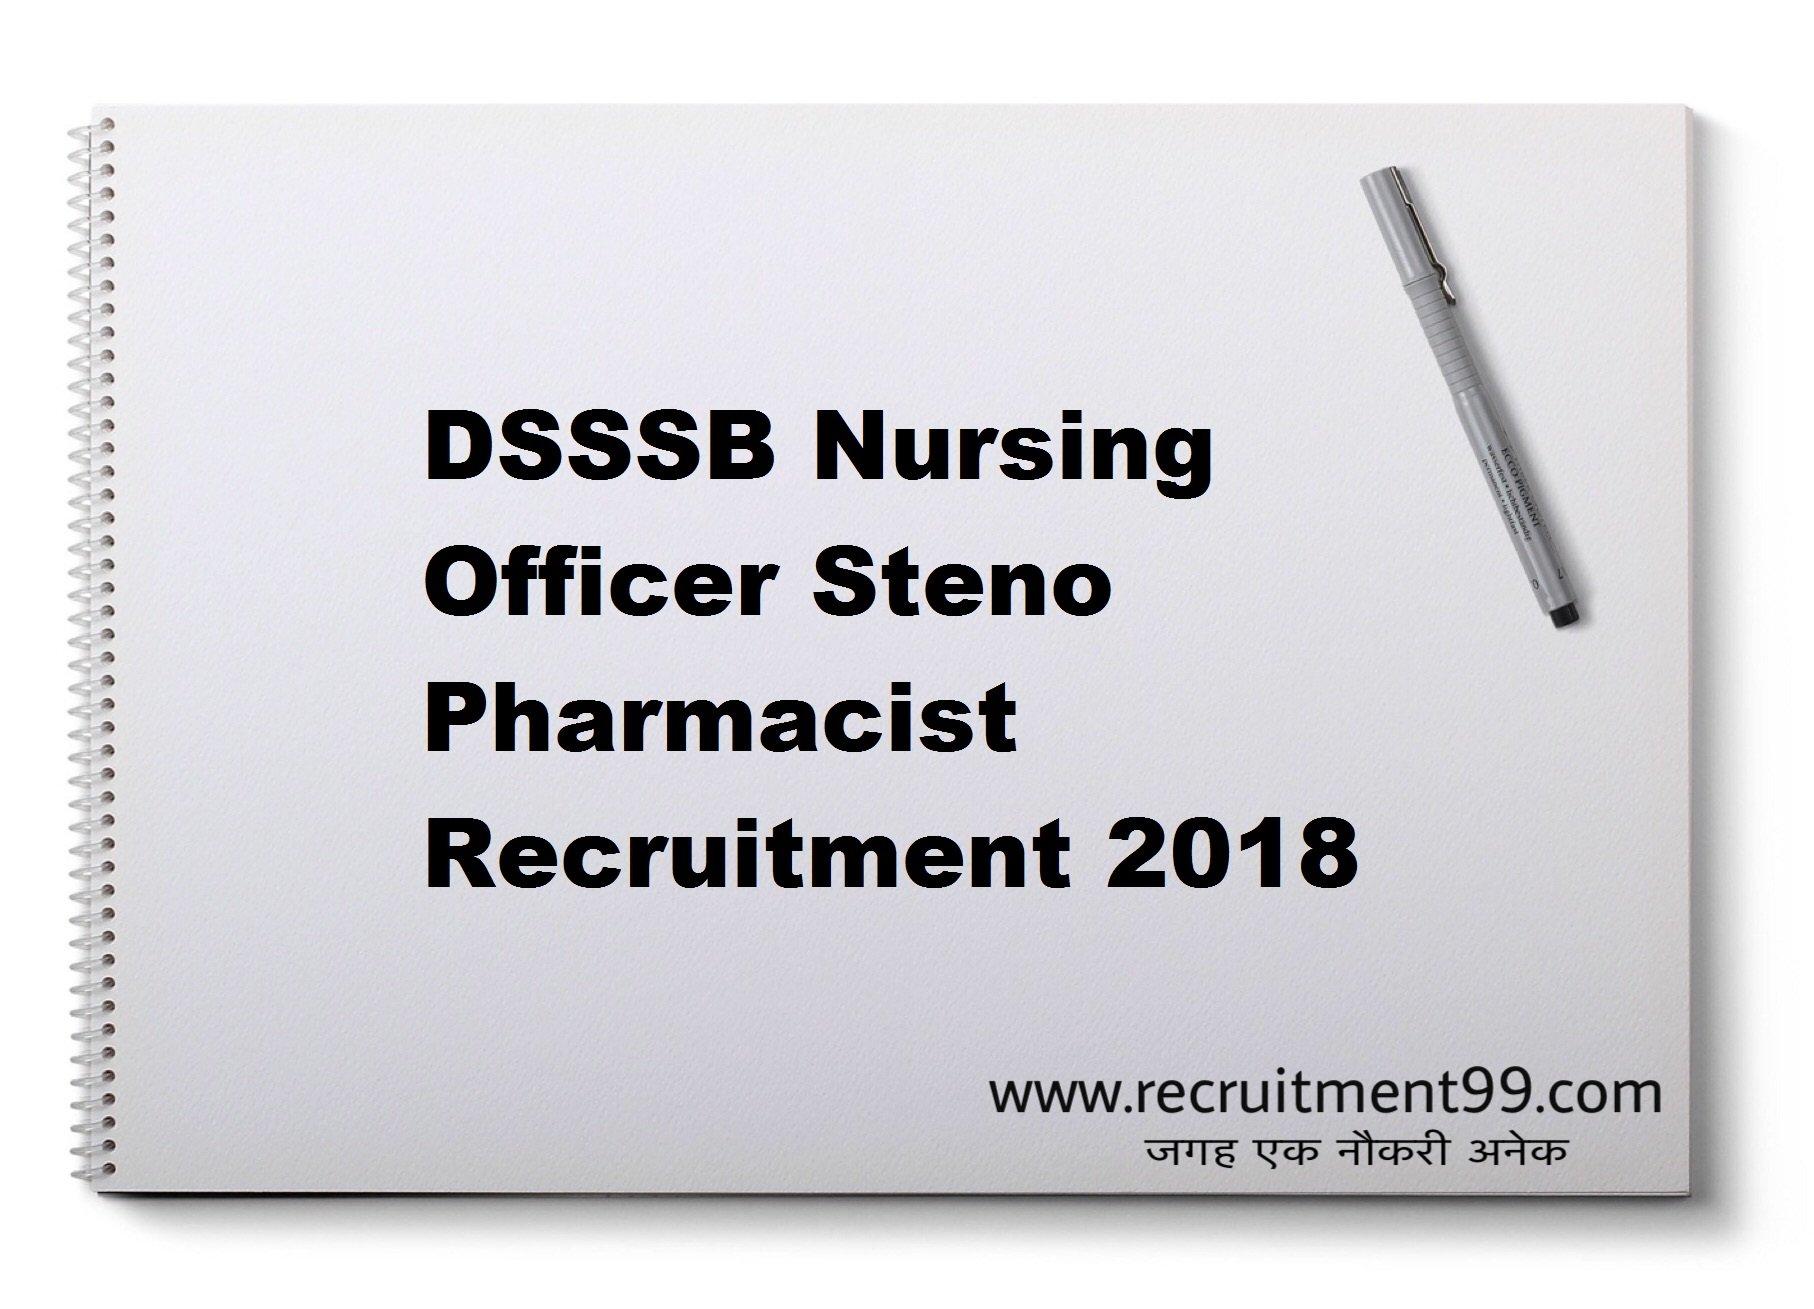 DSSSB Nursing Officer Pharmacist Steno Recruitment Admit Card Result 2018